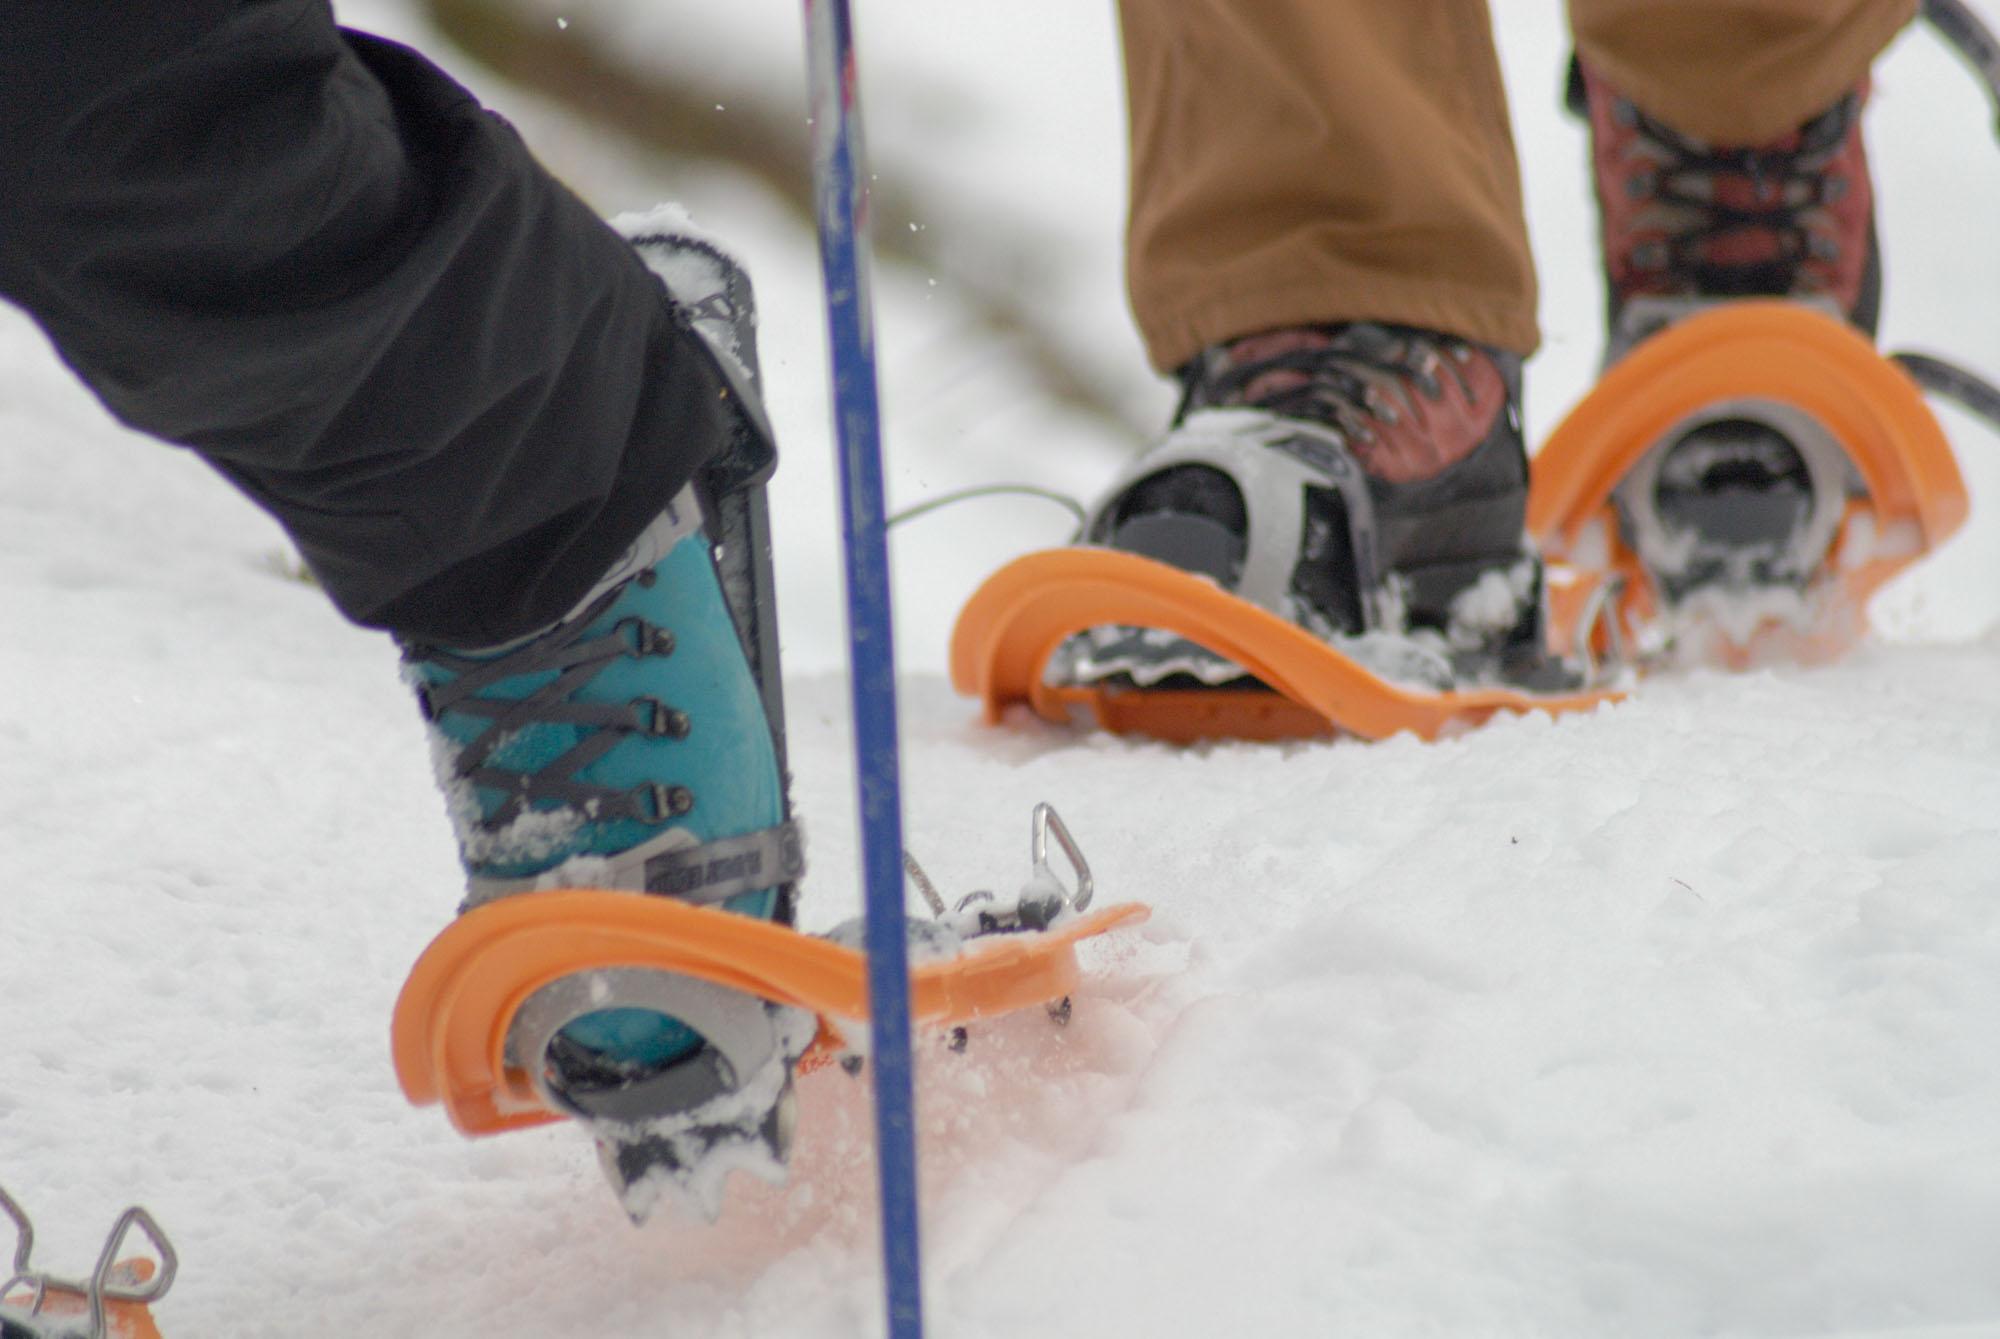 randonnée mercantour raquettes à neige avec rando06 rando83